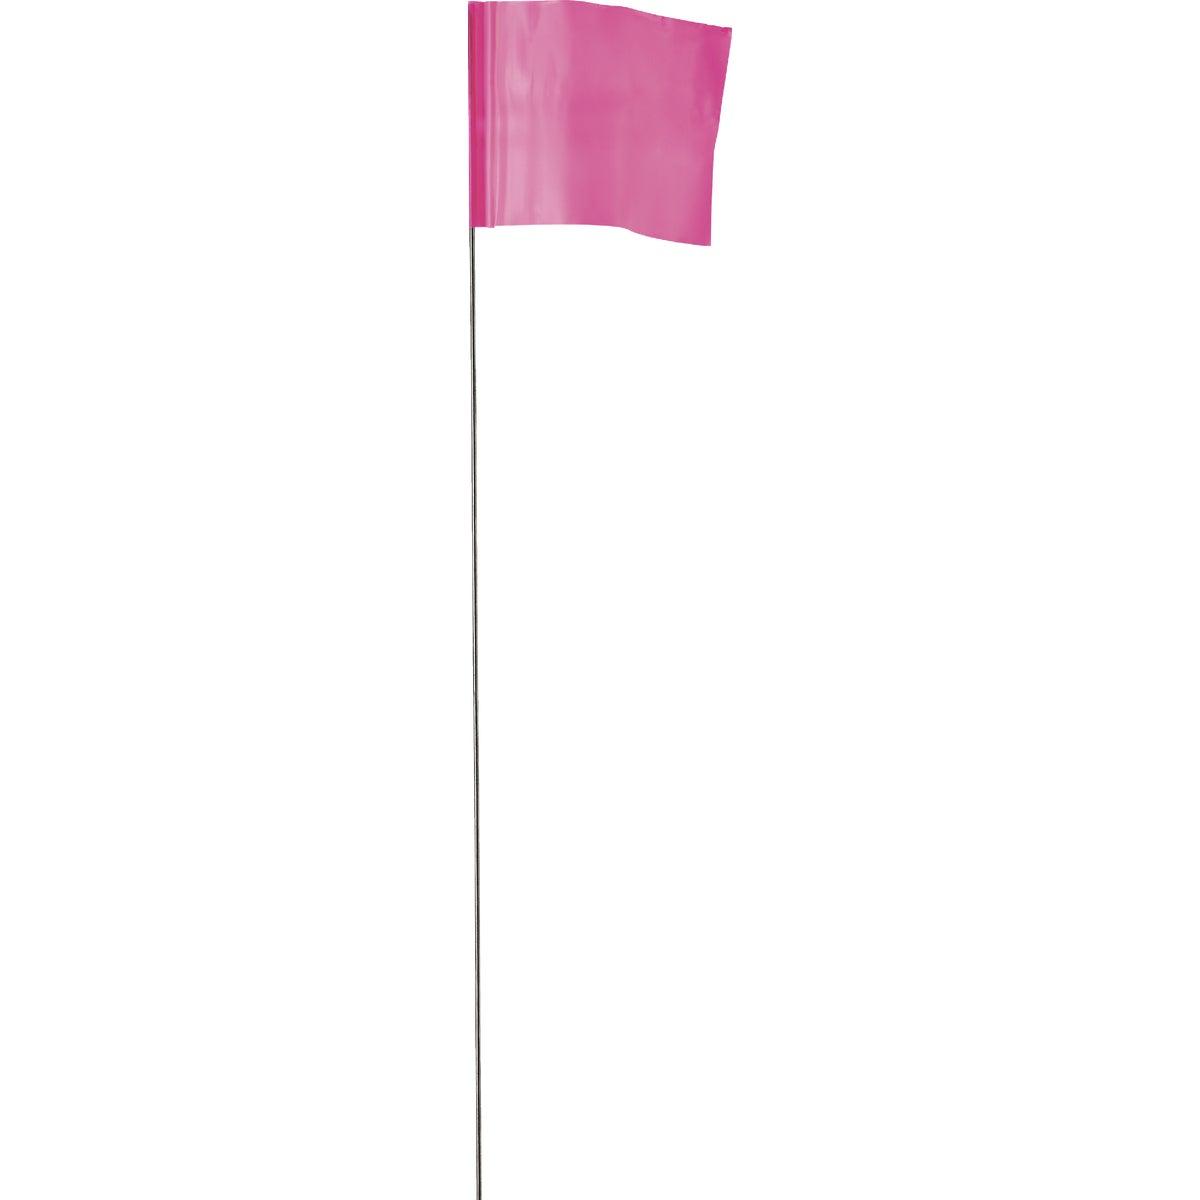 Irwin 100PK PINK FLAGS 64101